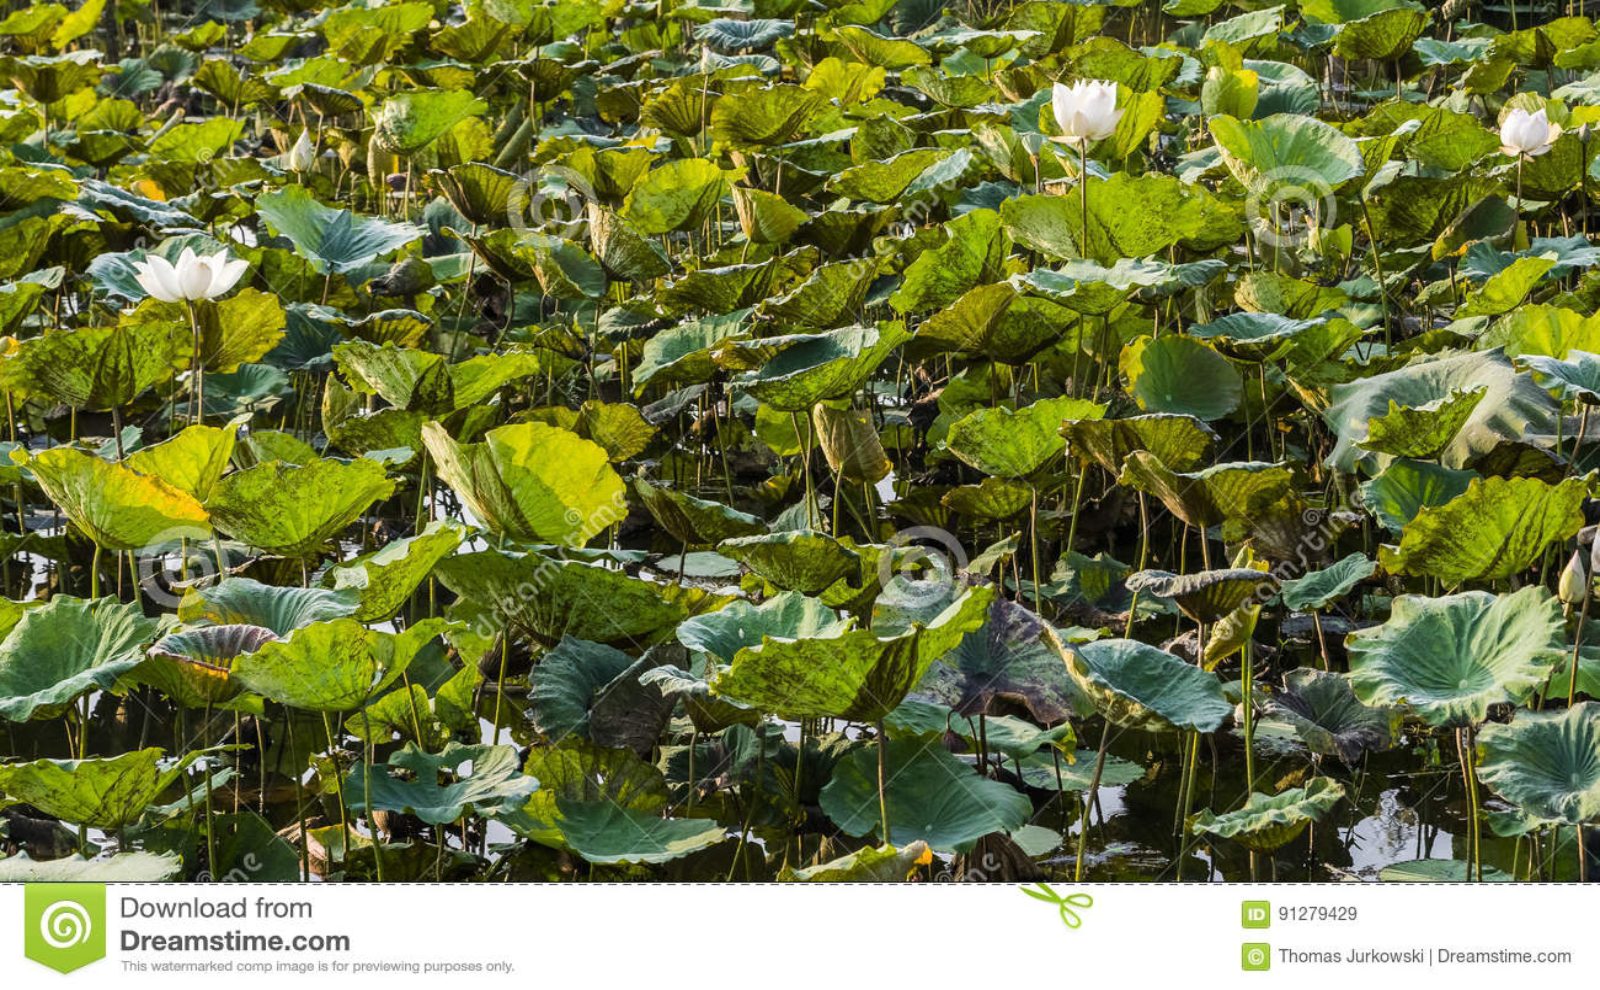 Plantation Of Lotus Flowers Stock Image Image Of Farm Fields